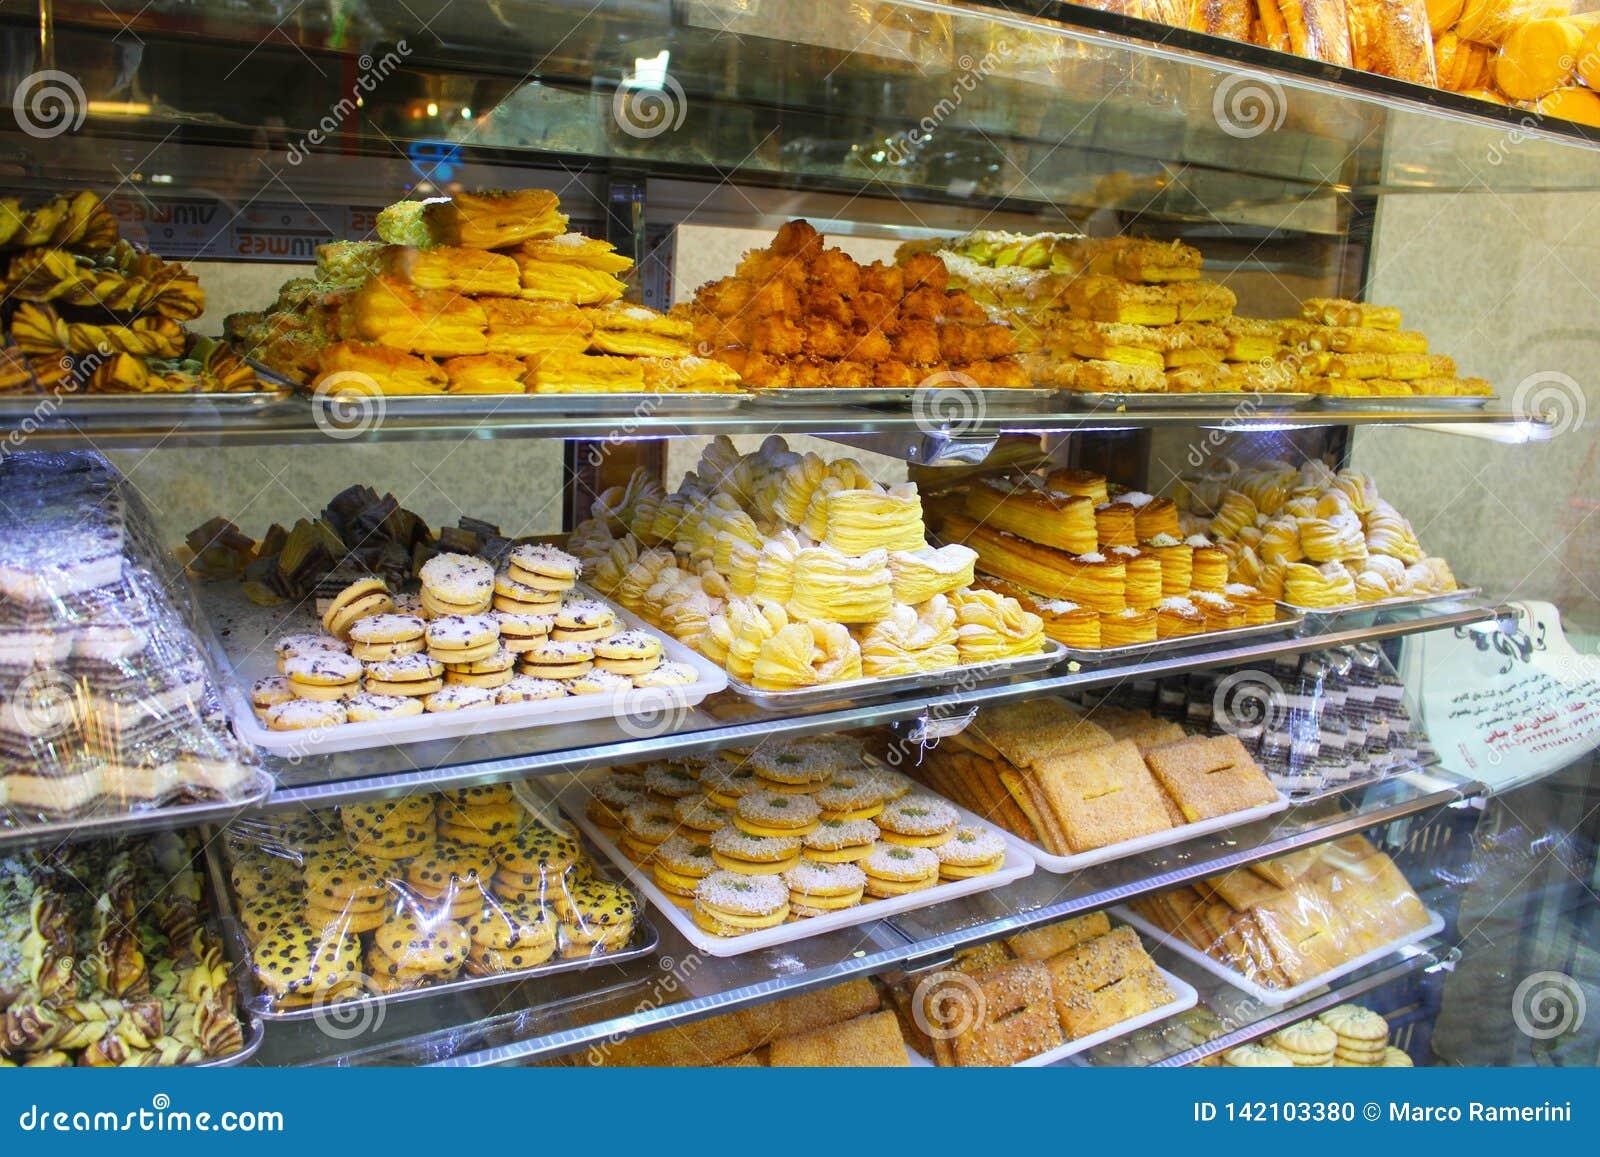 Iranian sweets in a shop, Isfahan, Iran